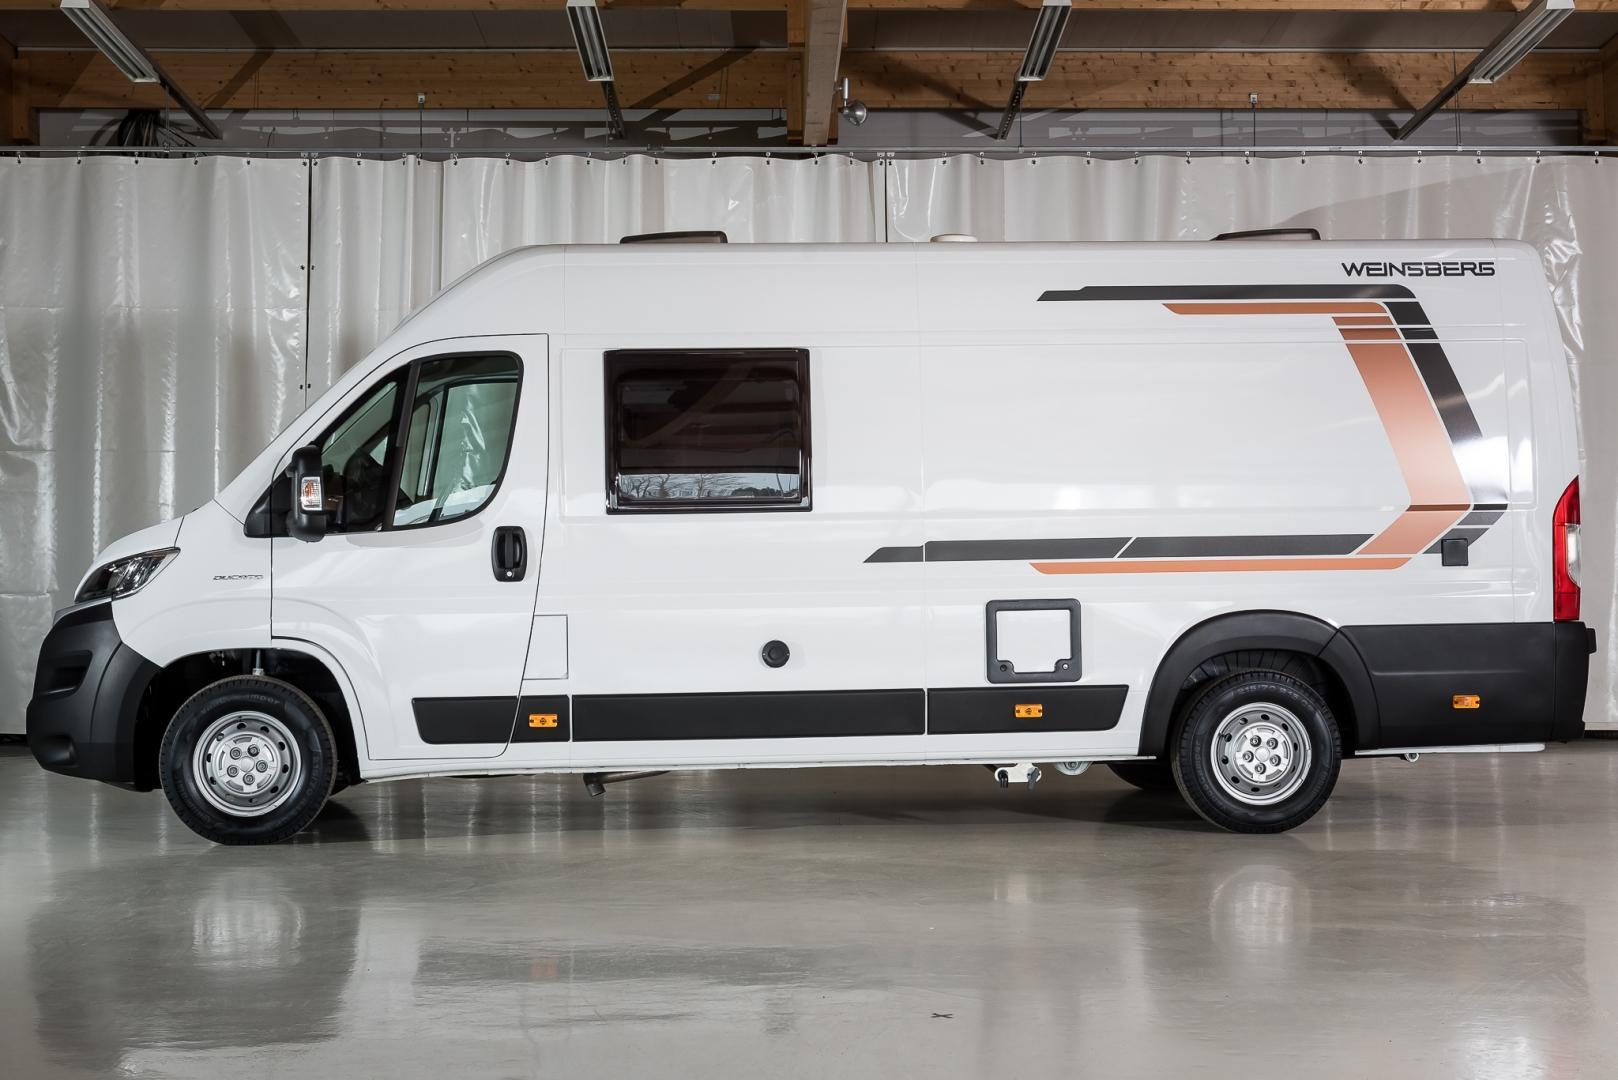 Weinsberg CaraBus 630 ME, 2,3 M-JET 130 HV